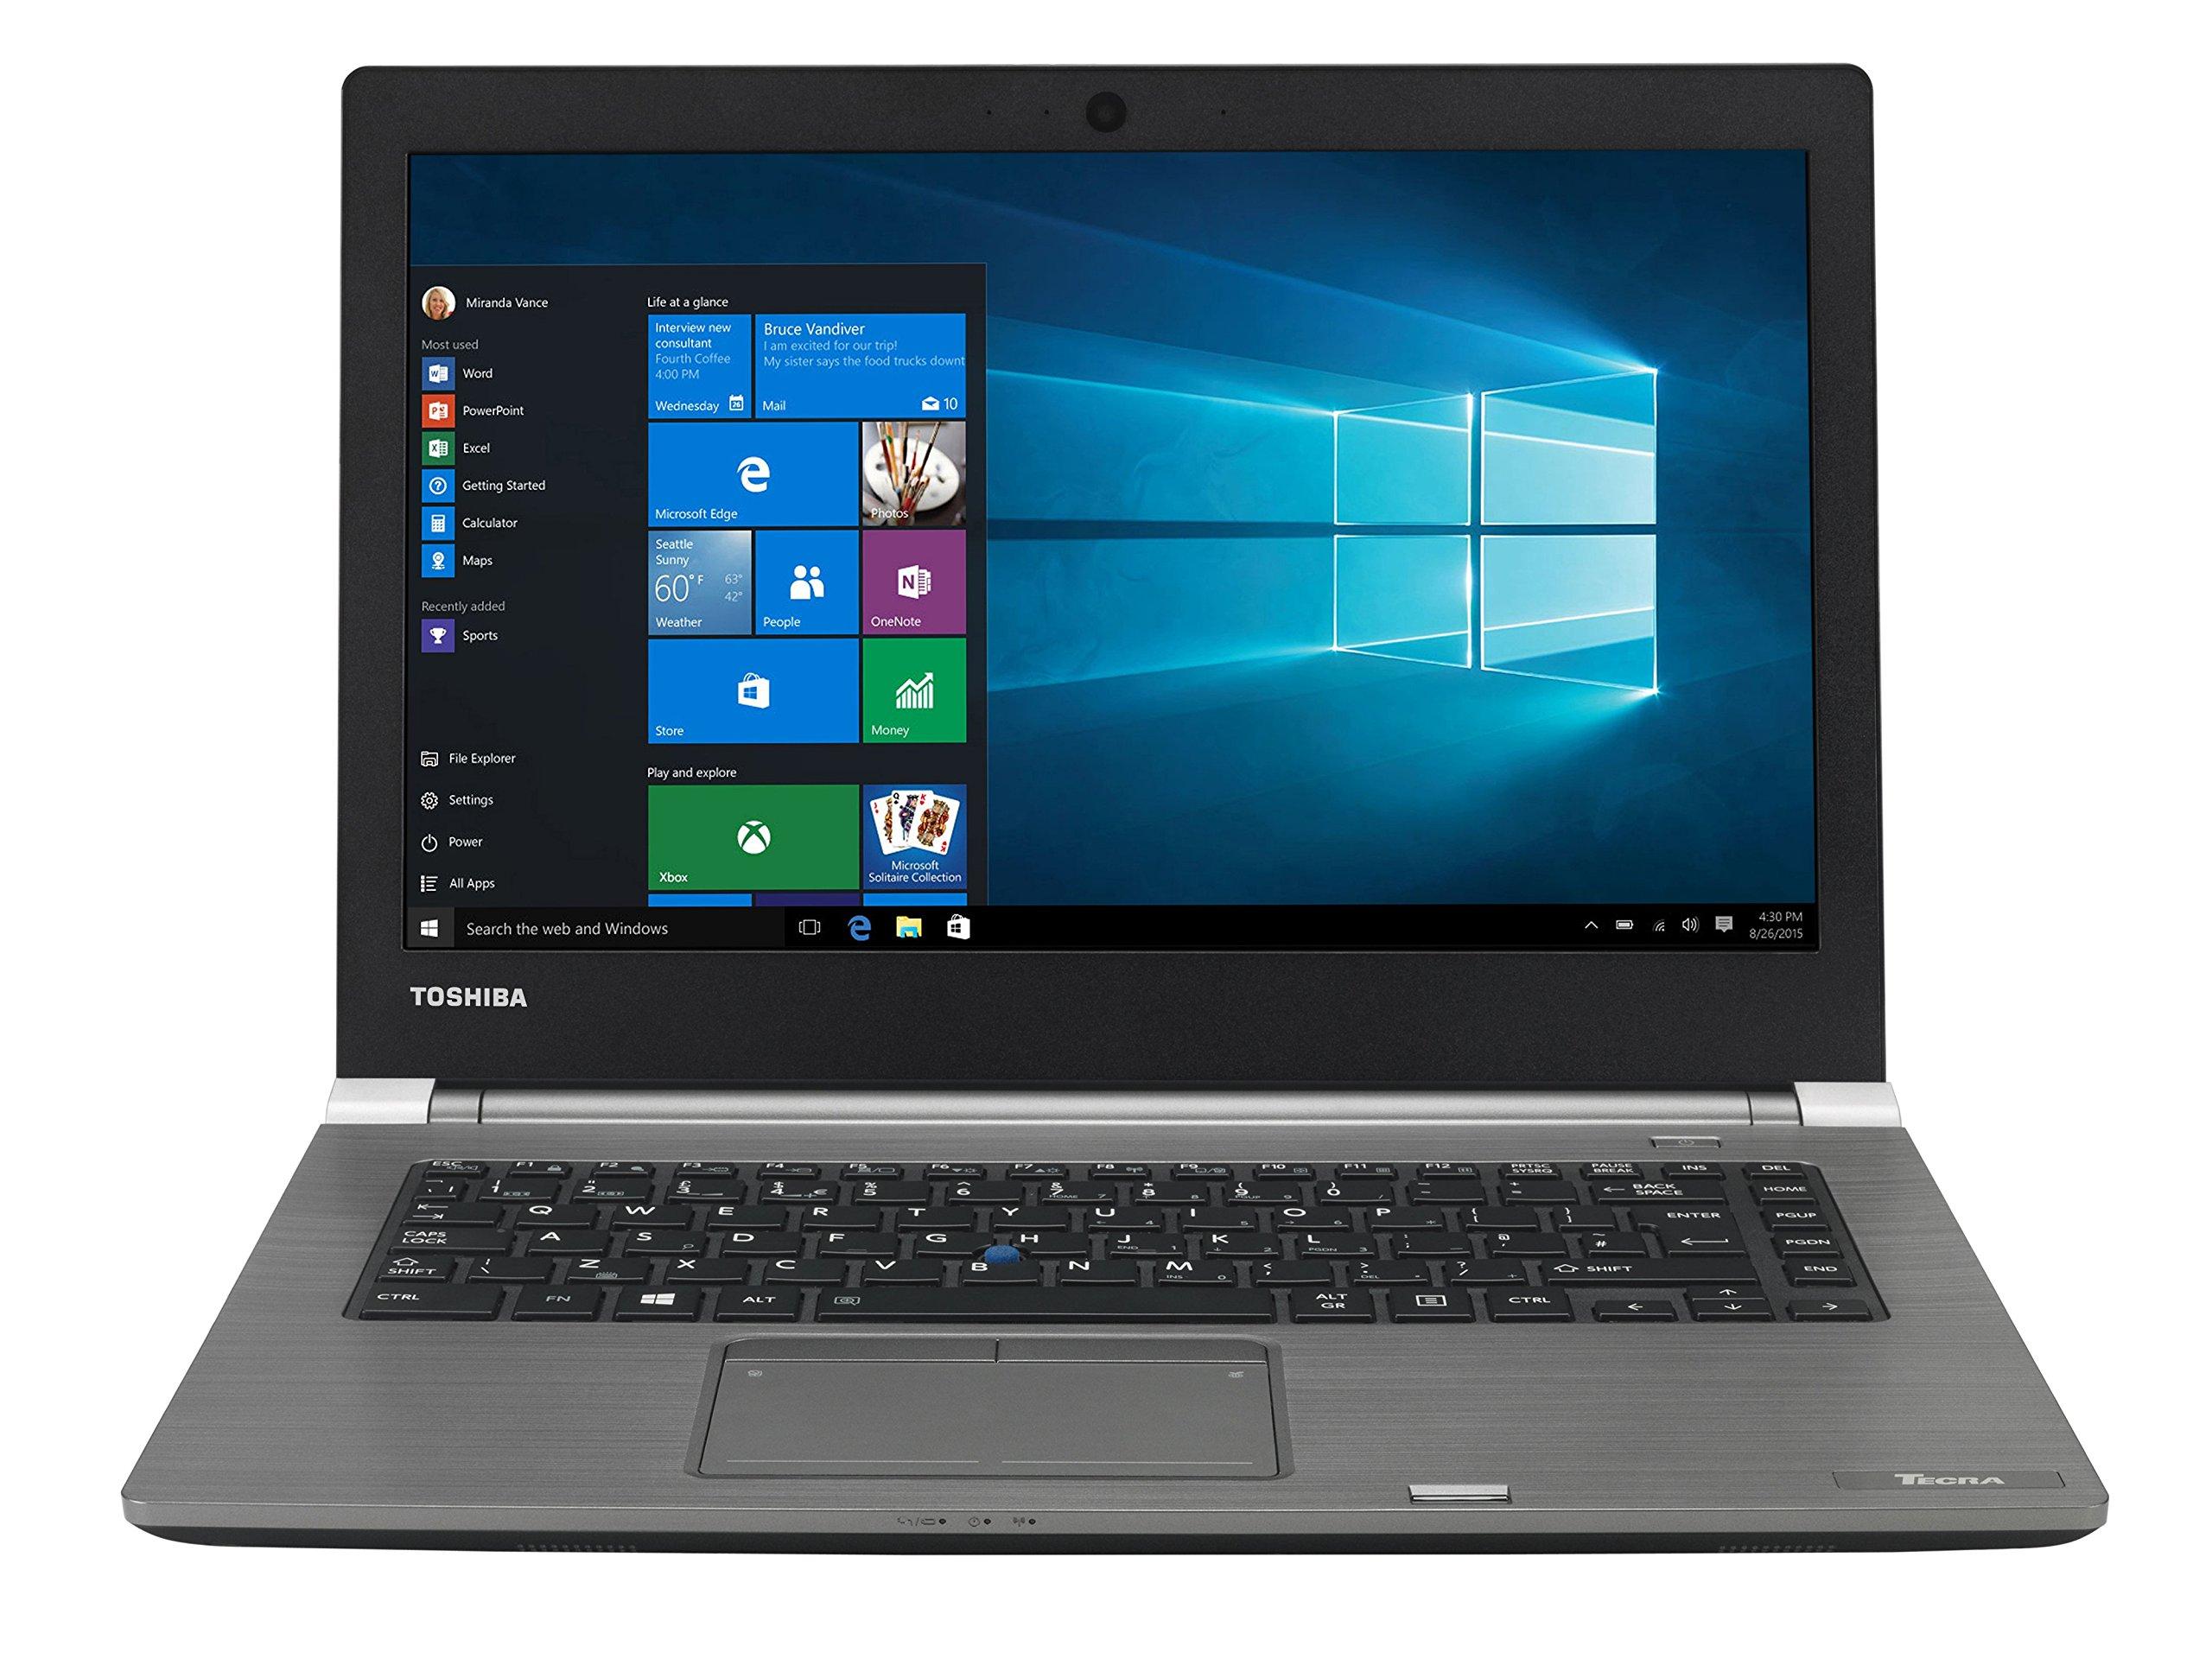 東芝PS463E-028005GR 35.56 cm(14インチ)A40-C-17Cラップトップ(Intel Core i5、8GB RAM、Win 10ブラック